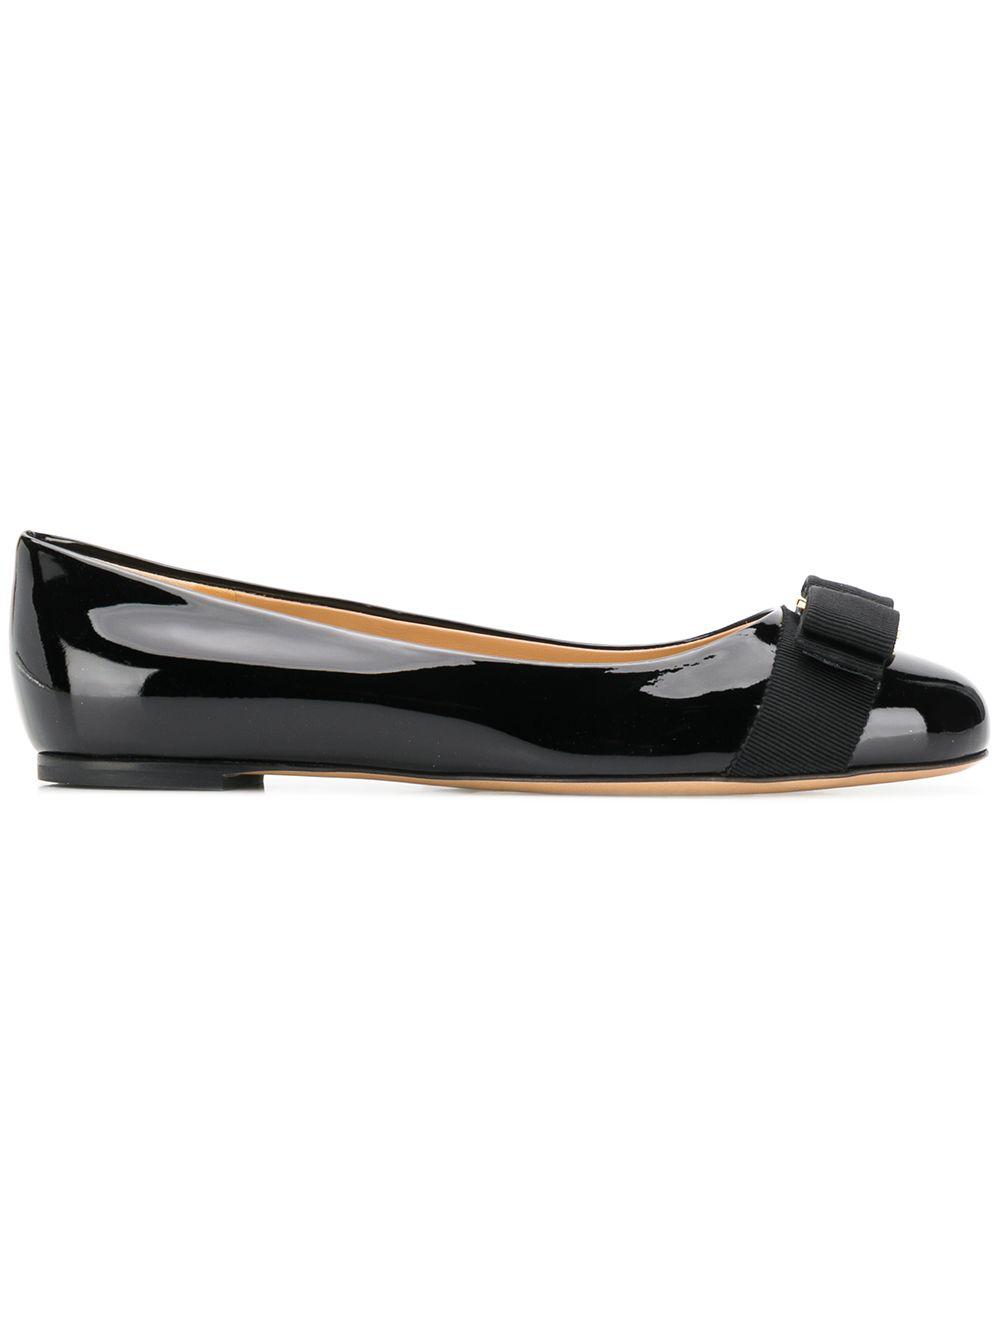 e32900d0c3 Salvatore Ferragamo Varina Studded Bow-Embellished Patent-Leather Ballet  Flats In Black